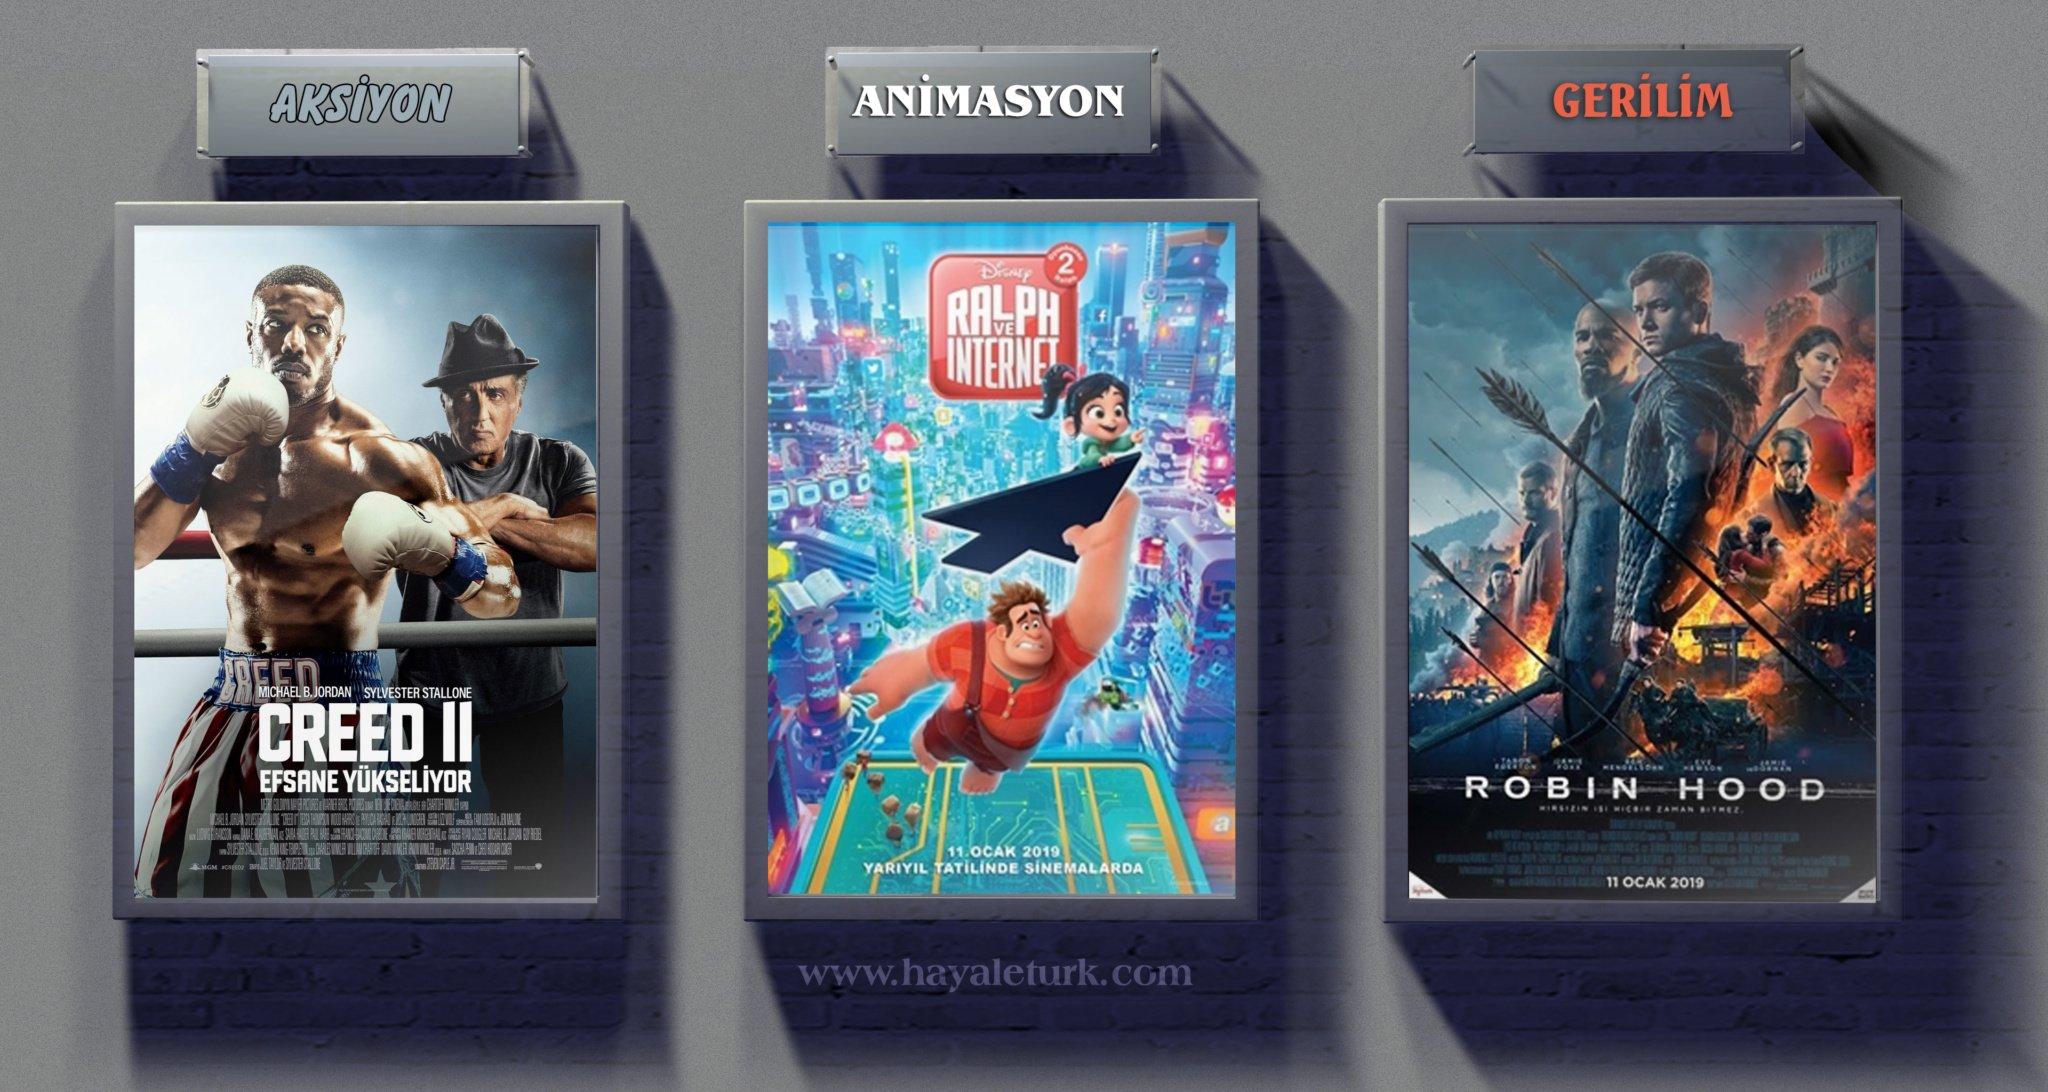 Sinemalarda bu hafta 7 Film vizyonda 11 - 18 Ocak 2019